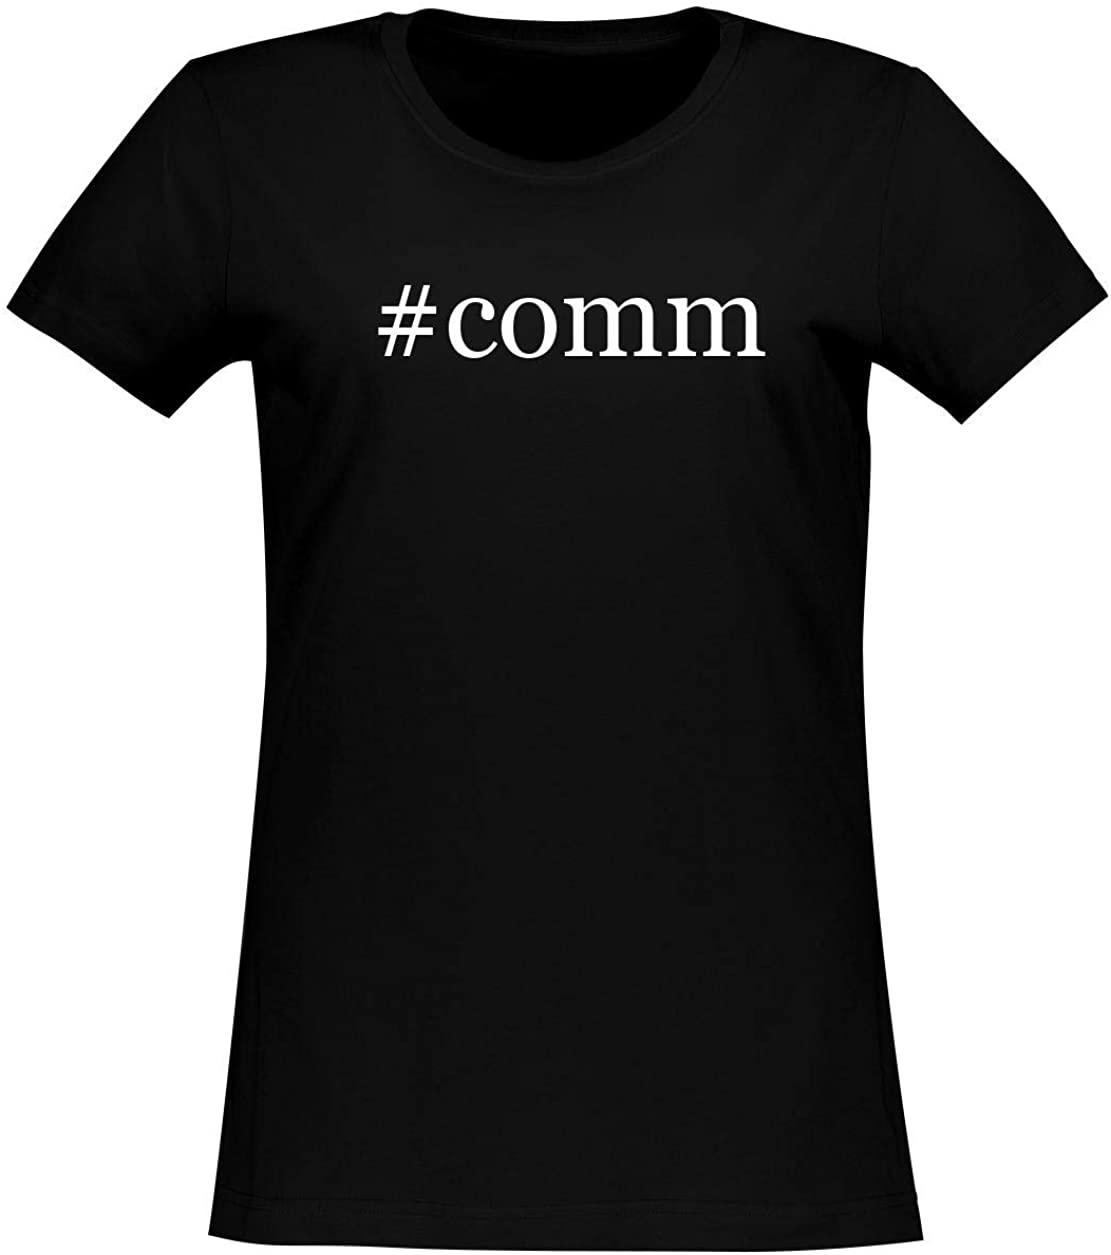 #comm - Women's Soft & Comfortable Hashtag Junior Cut T-Shirt